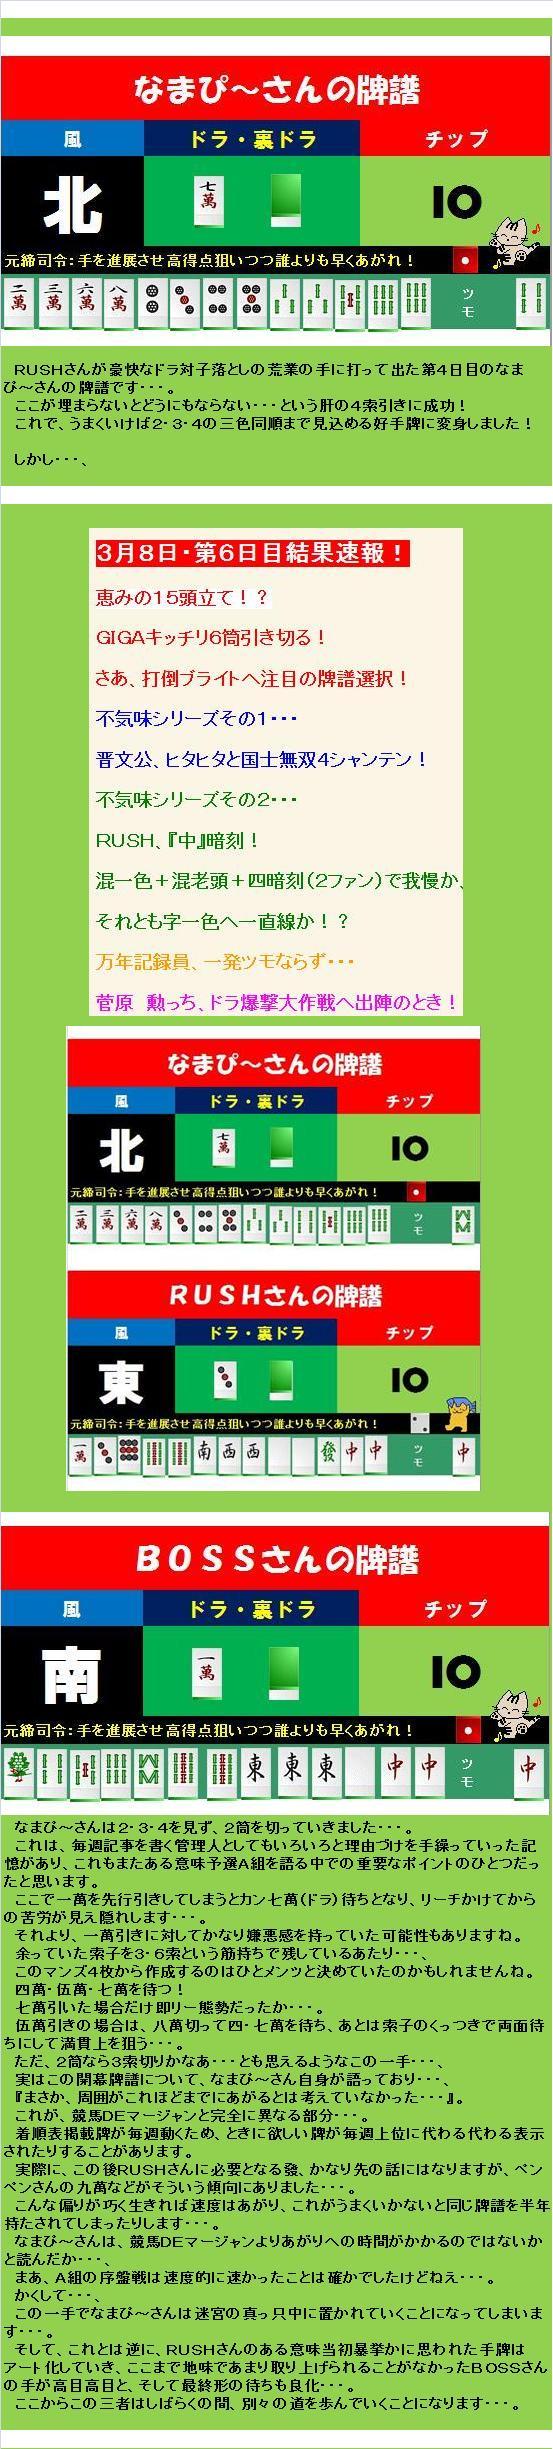 20100226・A組回顧05.jpg